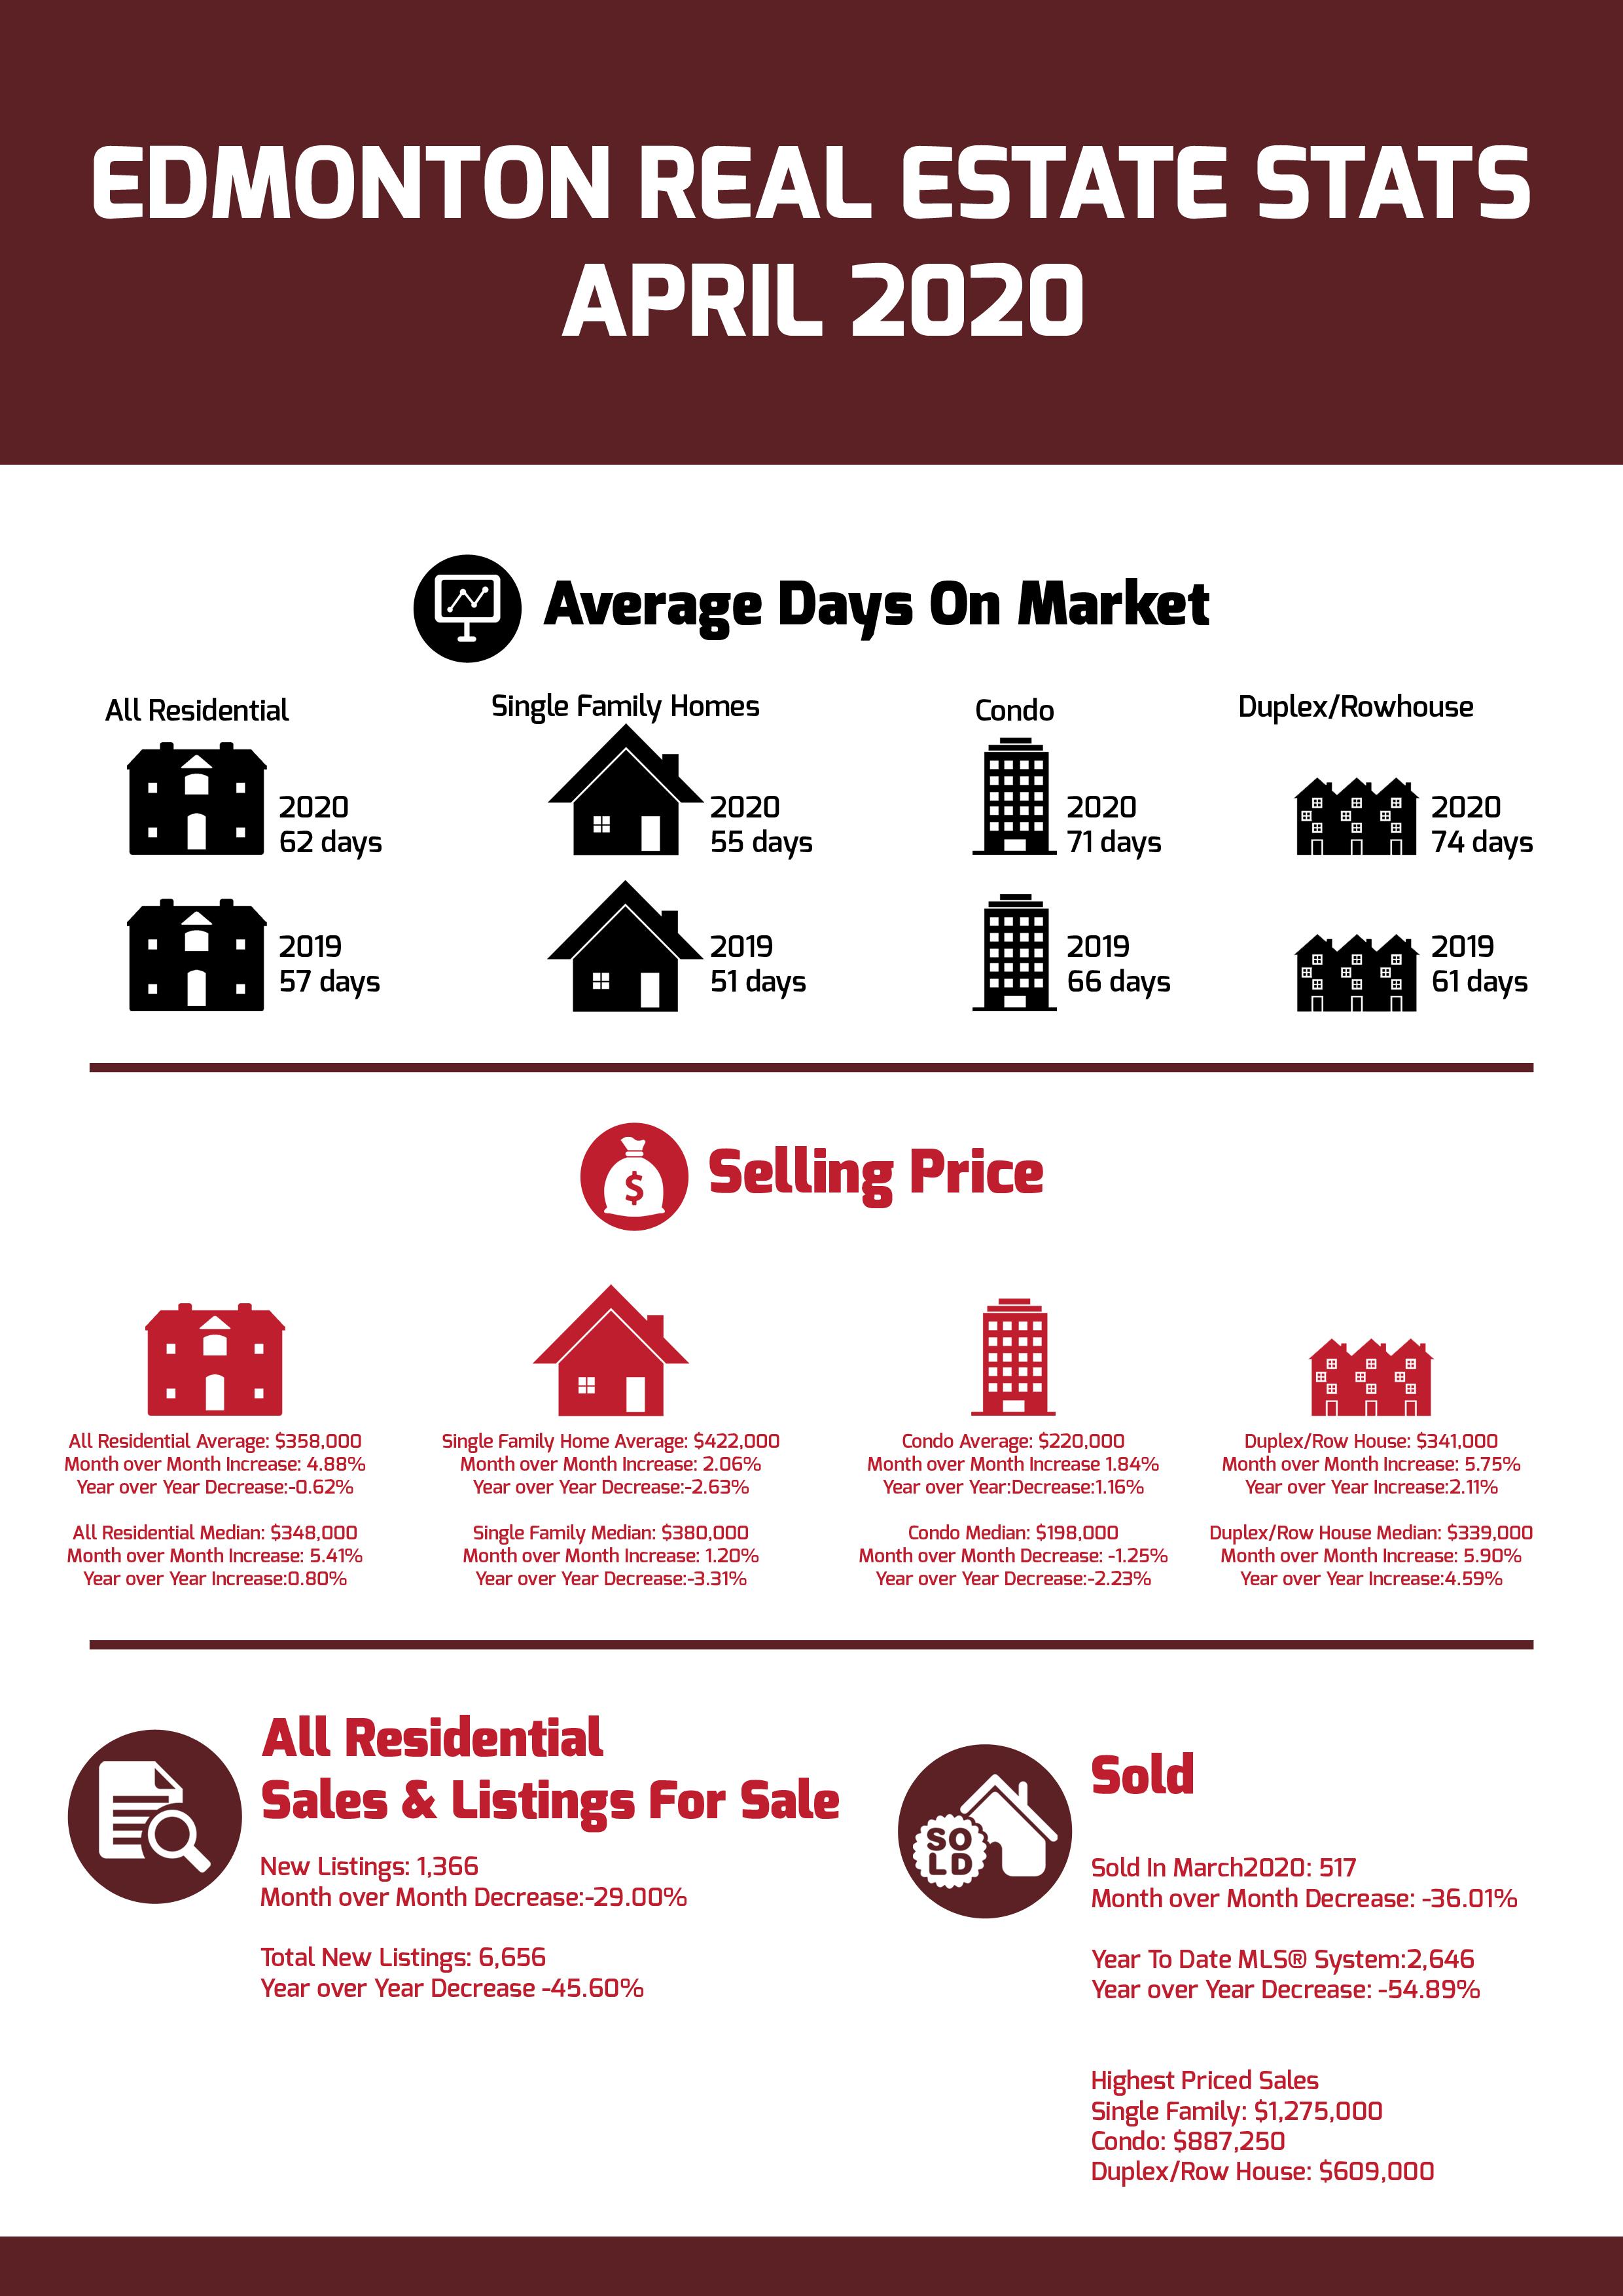 Edmonton Real Estate Stats April 2020